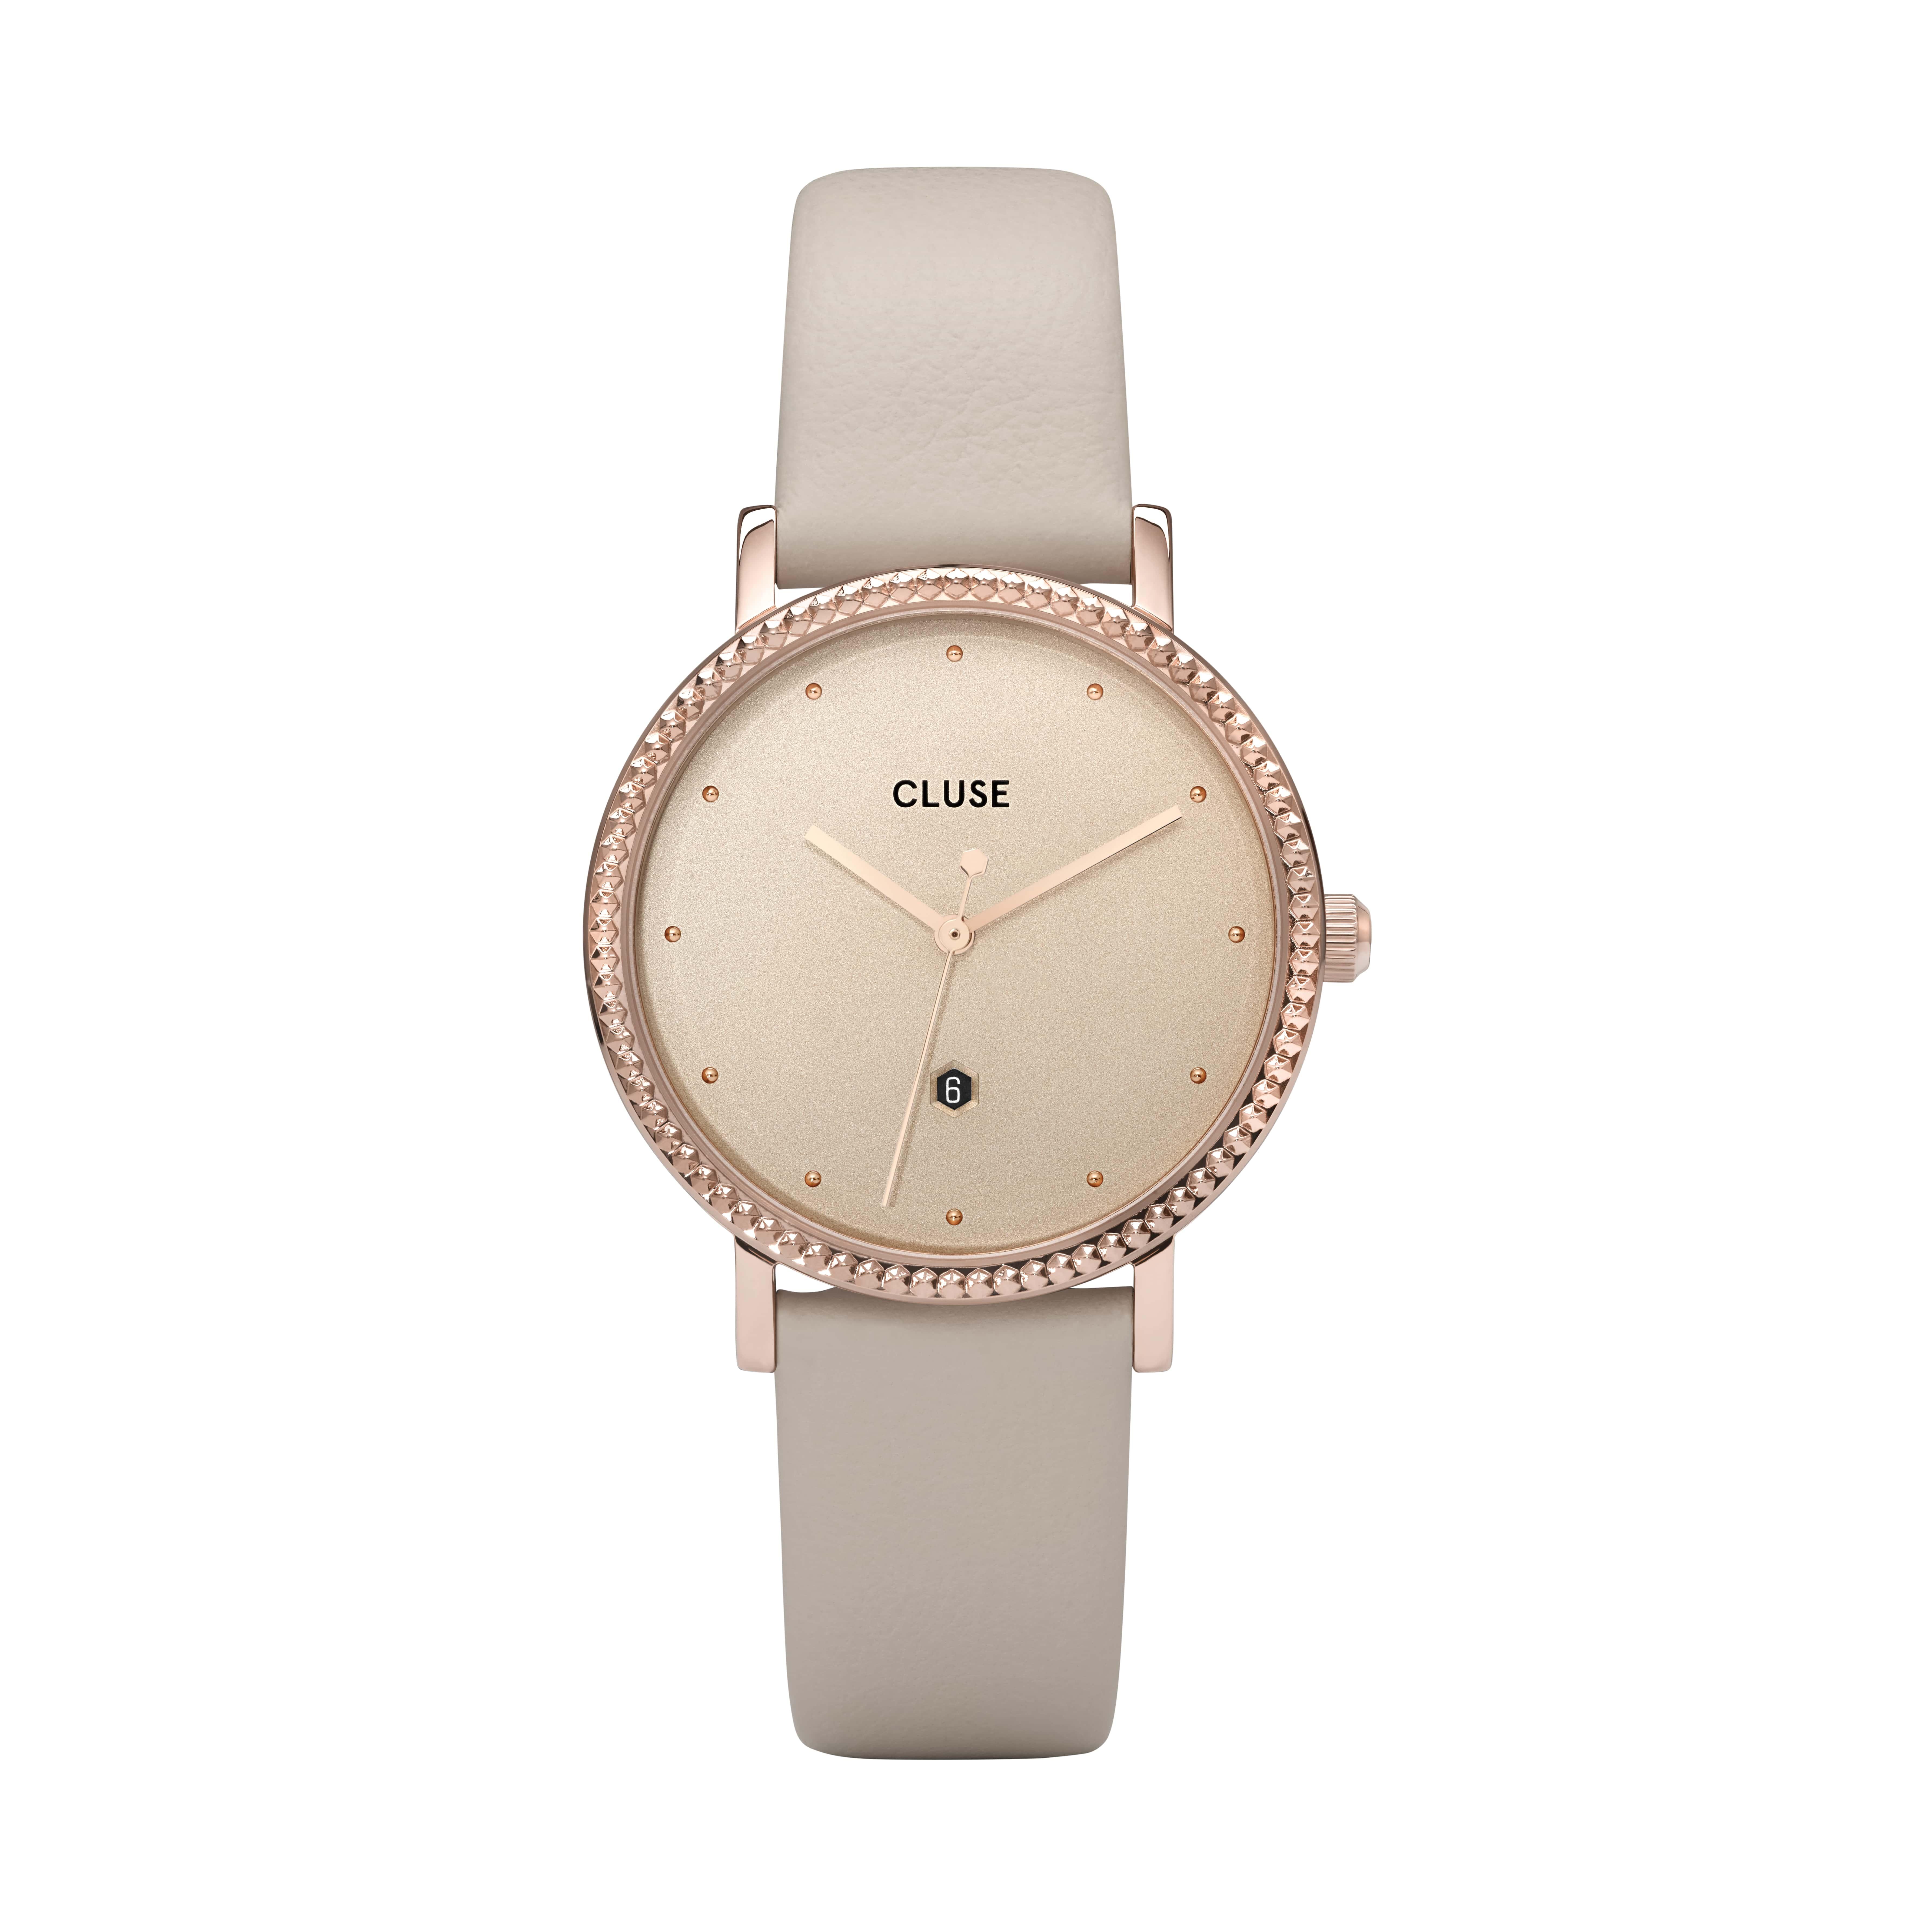 Cluse orologi donna primavera 2019